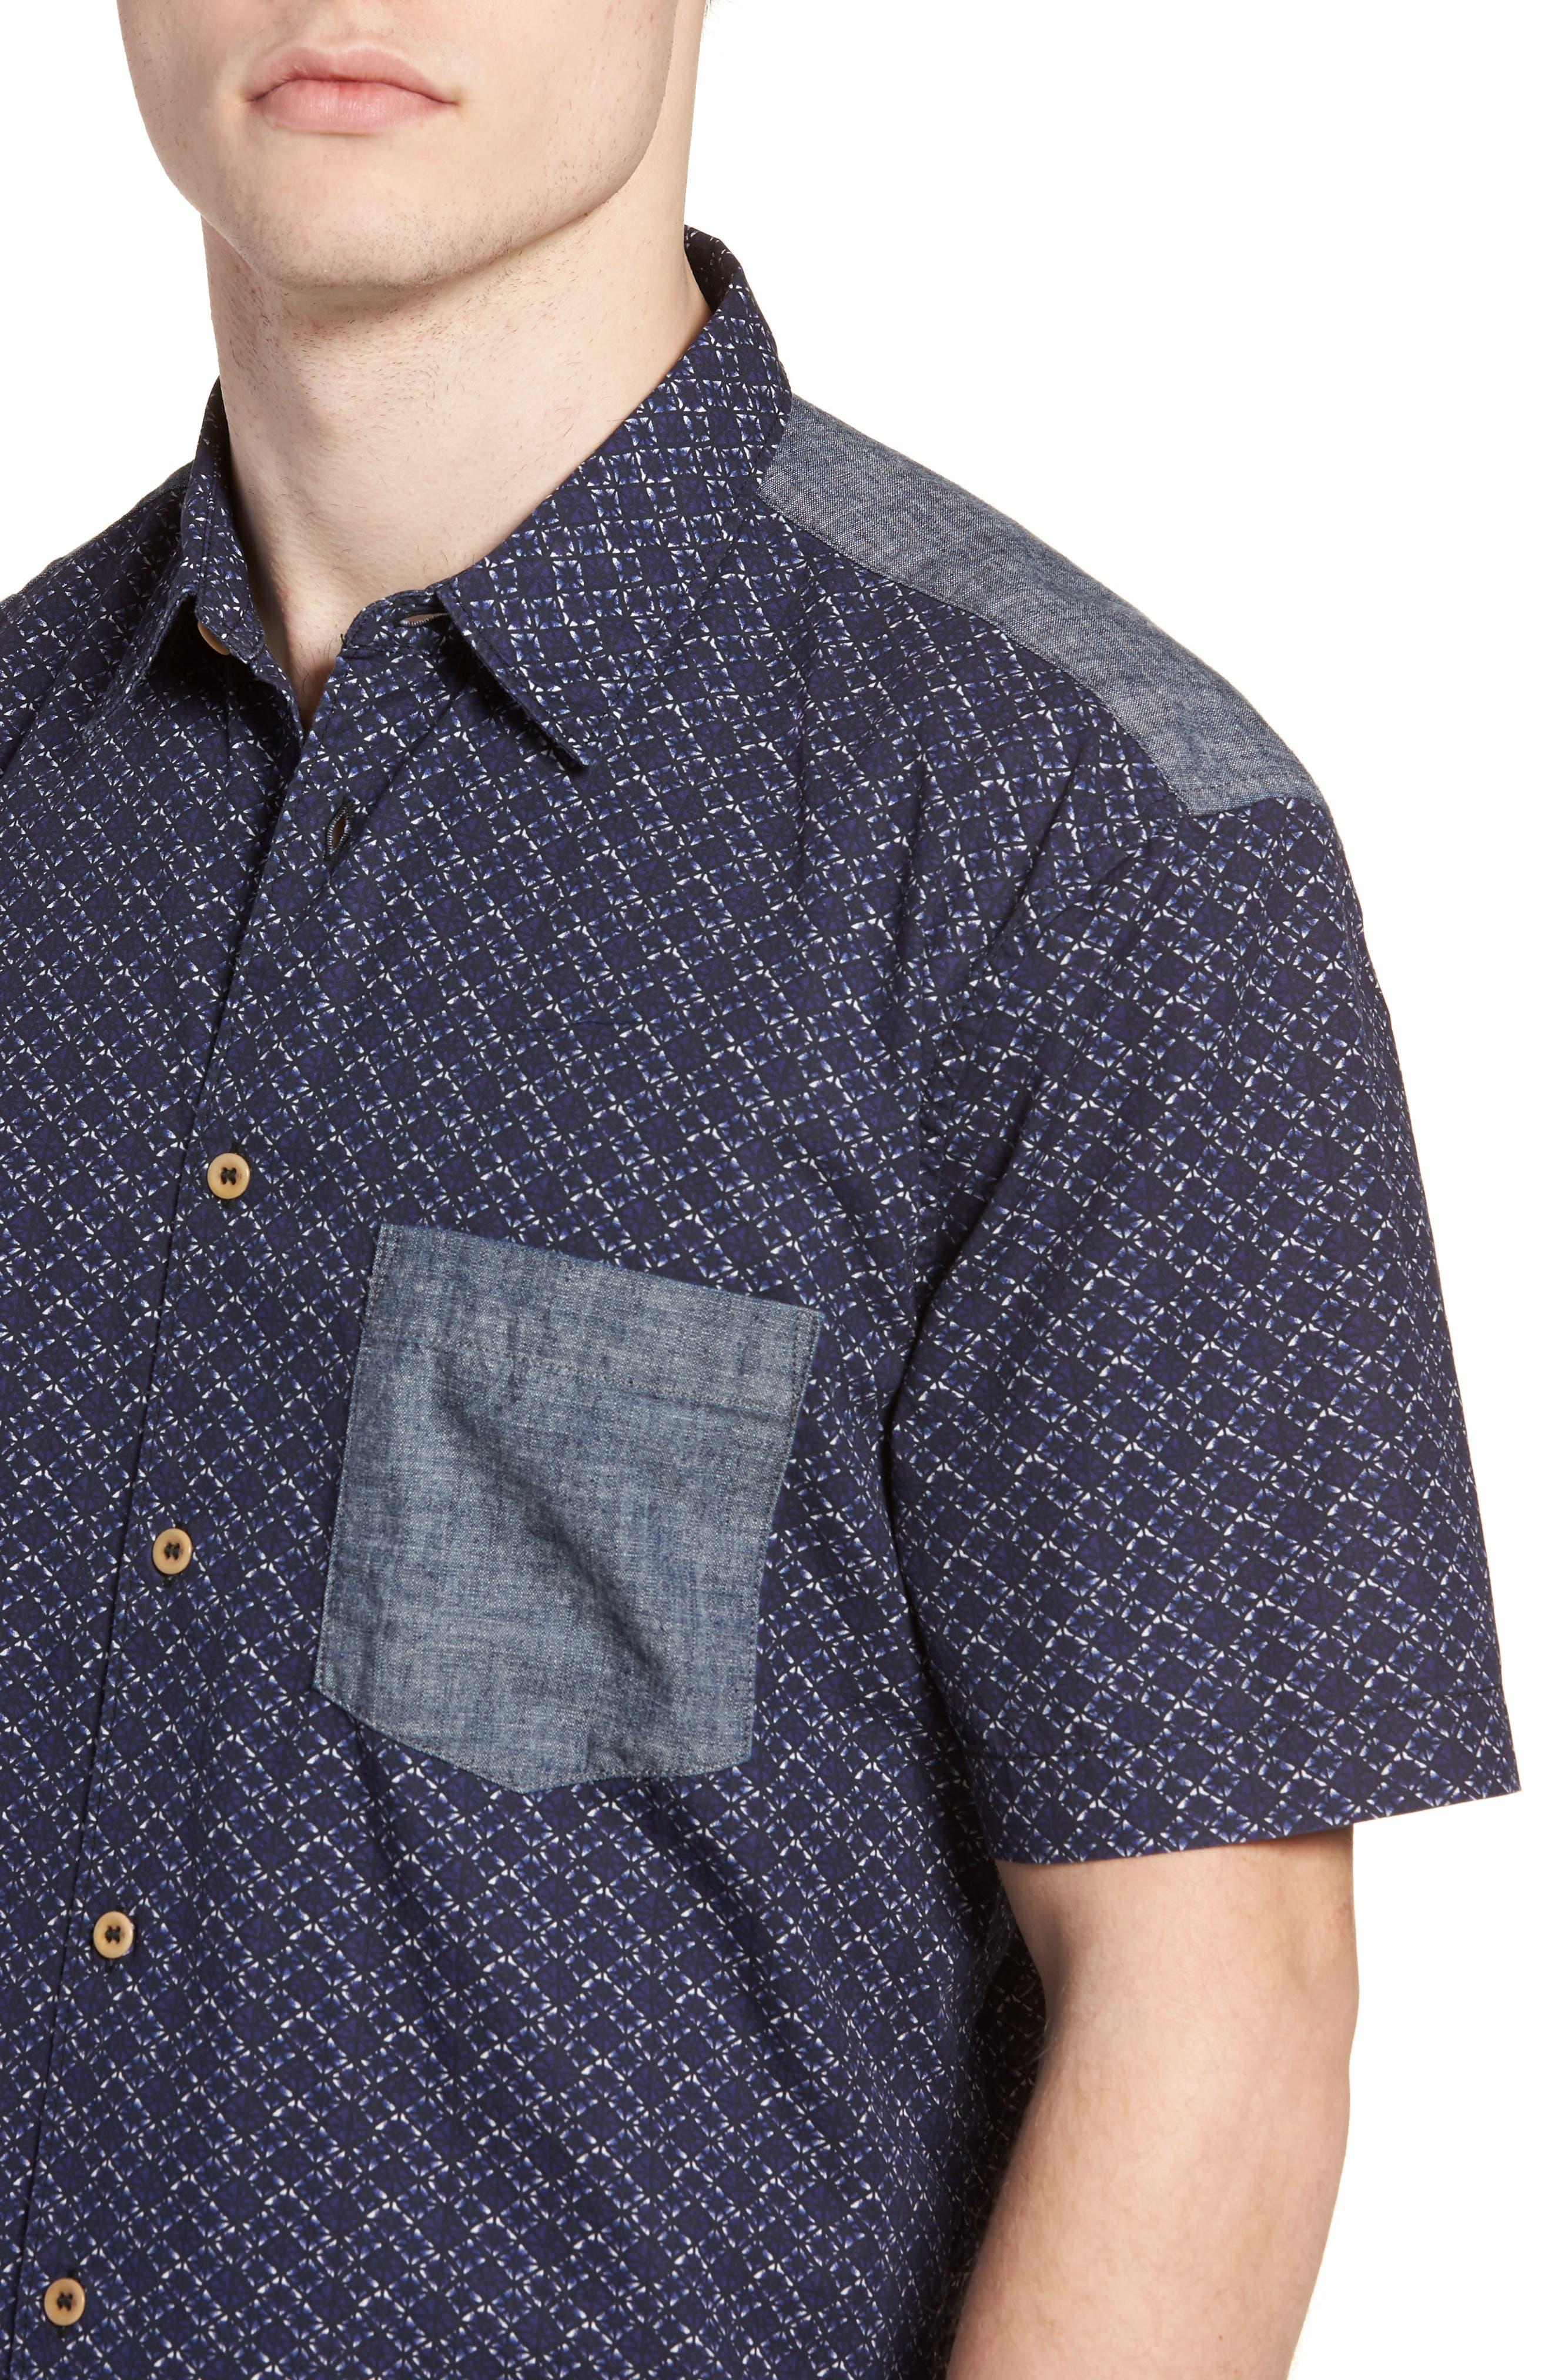 Kast Relaxed Fit Short Sleeve Sport Shirt,                             Alternate thumbnail 4, color,                             410